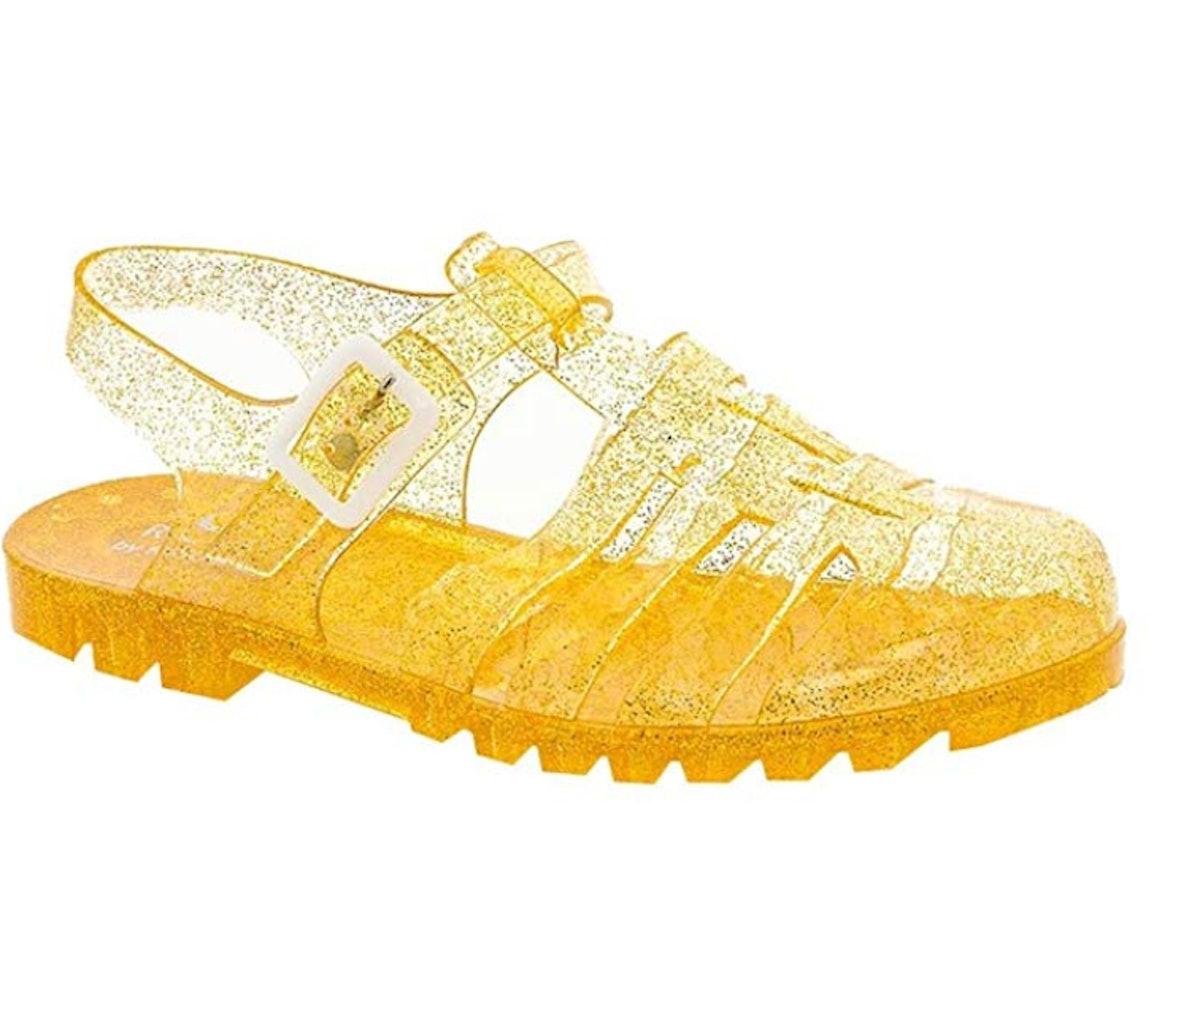 Rasolli Women's Fisherman T-Strap Jelly Flat Buckle Closure Soft Gladiator Sandals